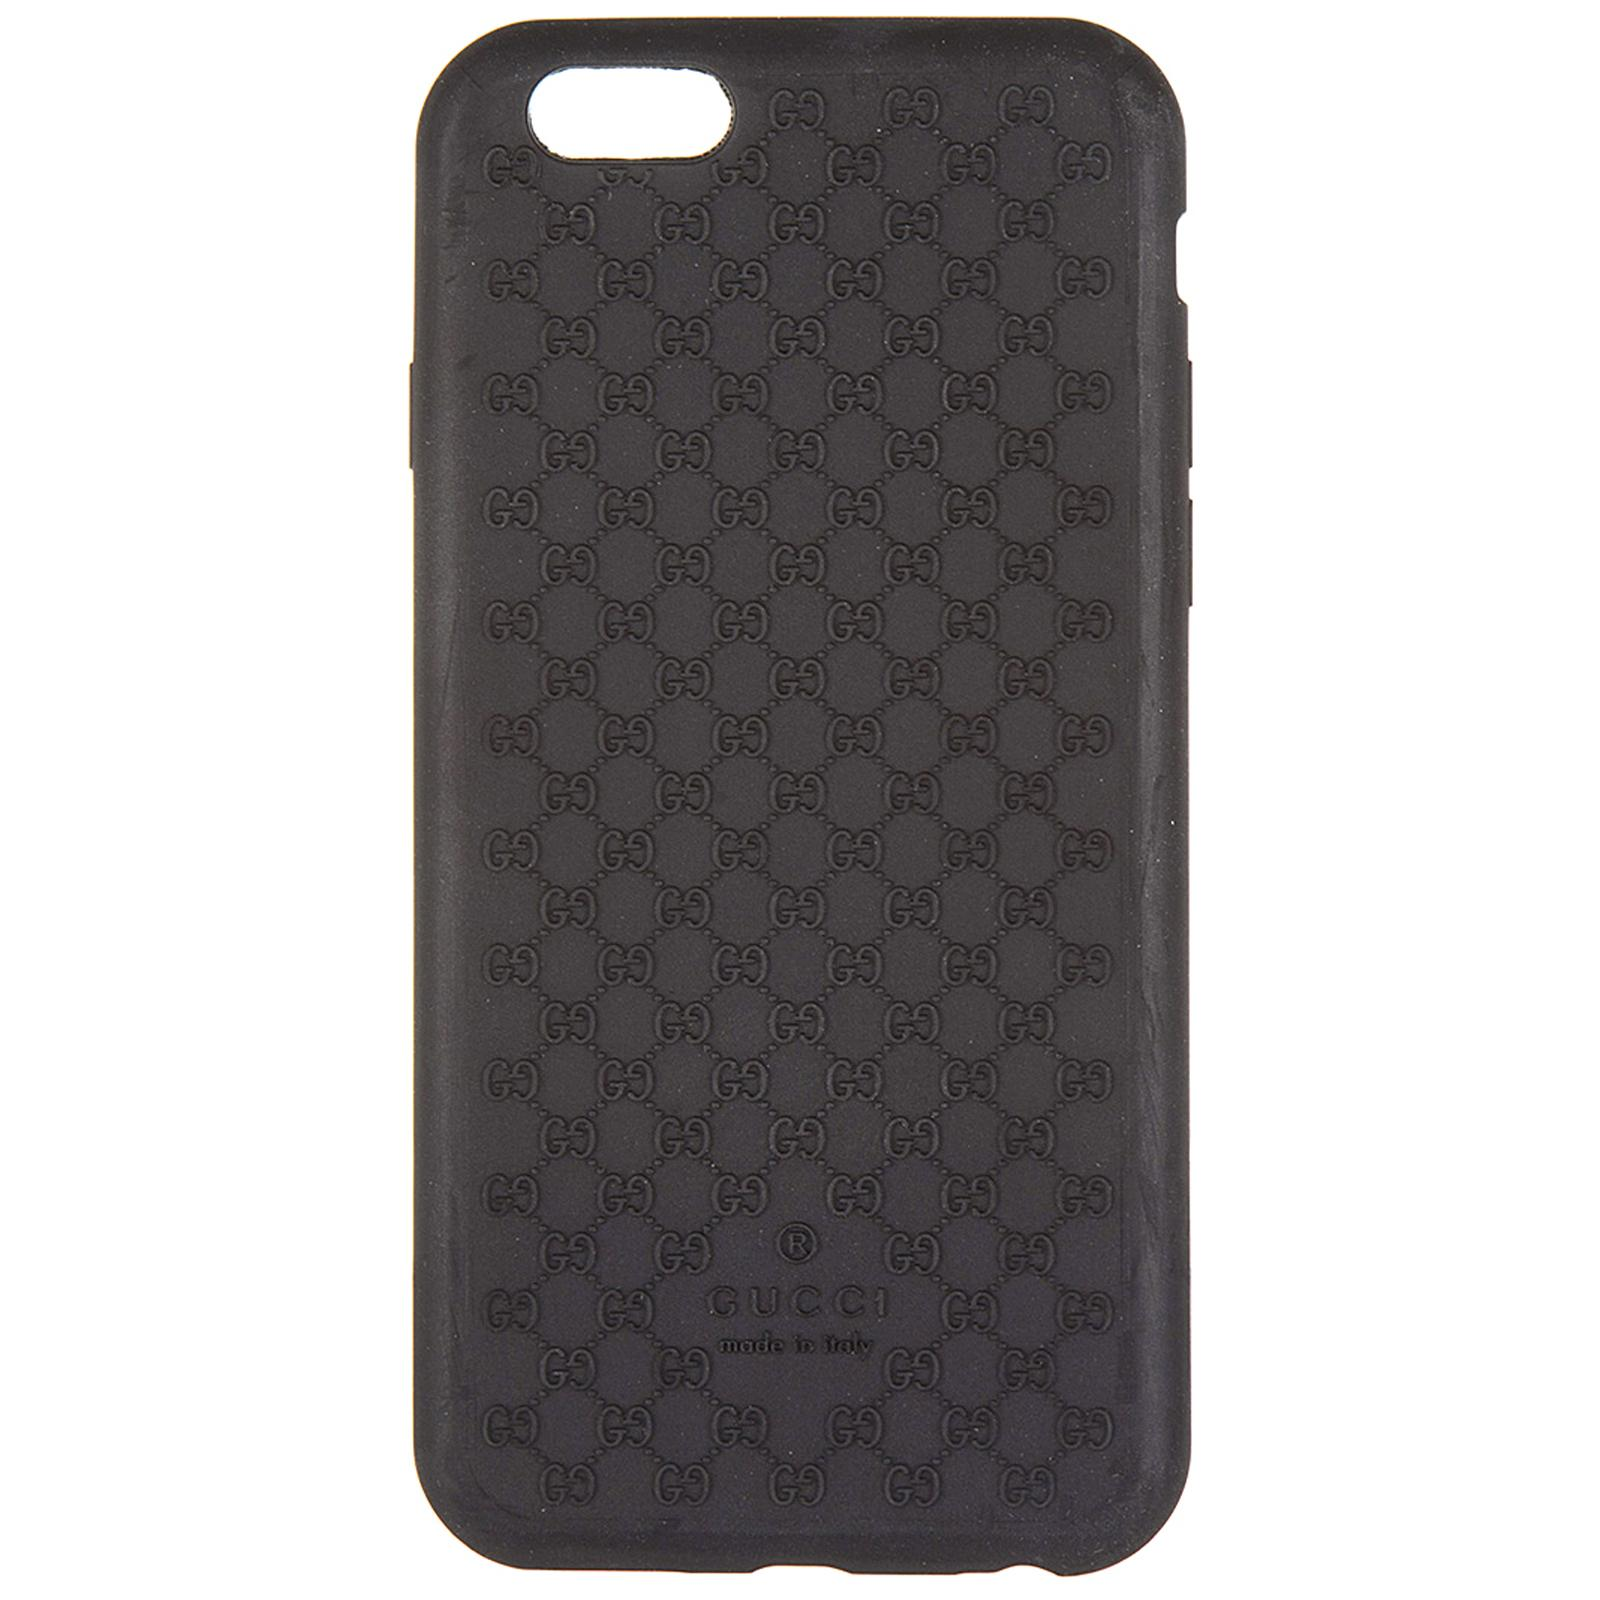 enorme sconto cf9f9 e0e7d Cover Case Iphone 6 6S In Soft Rubber in Black